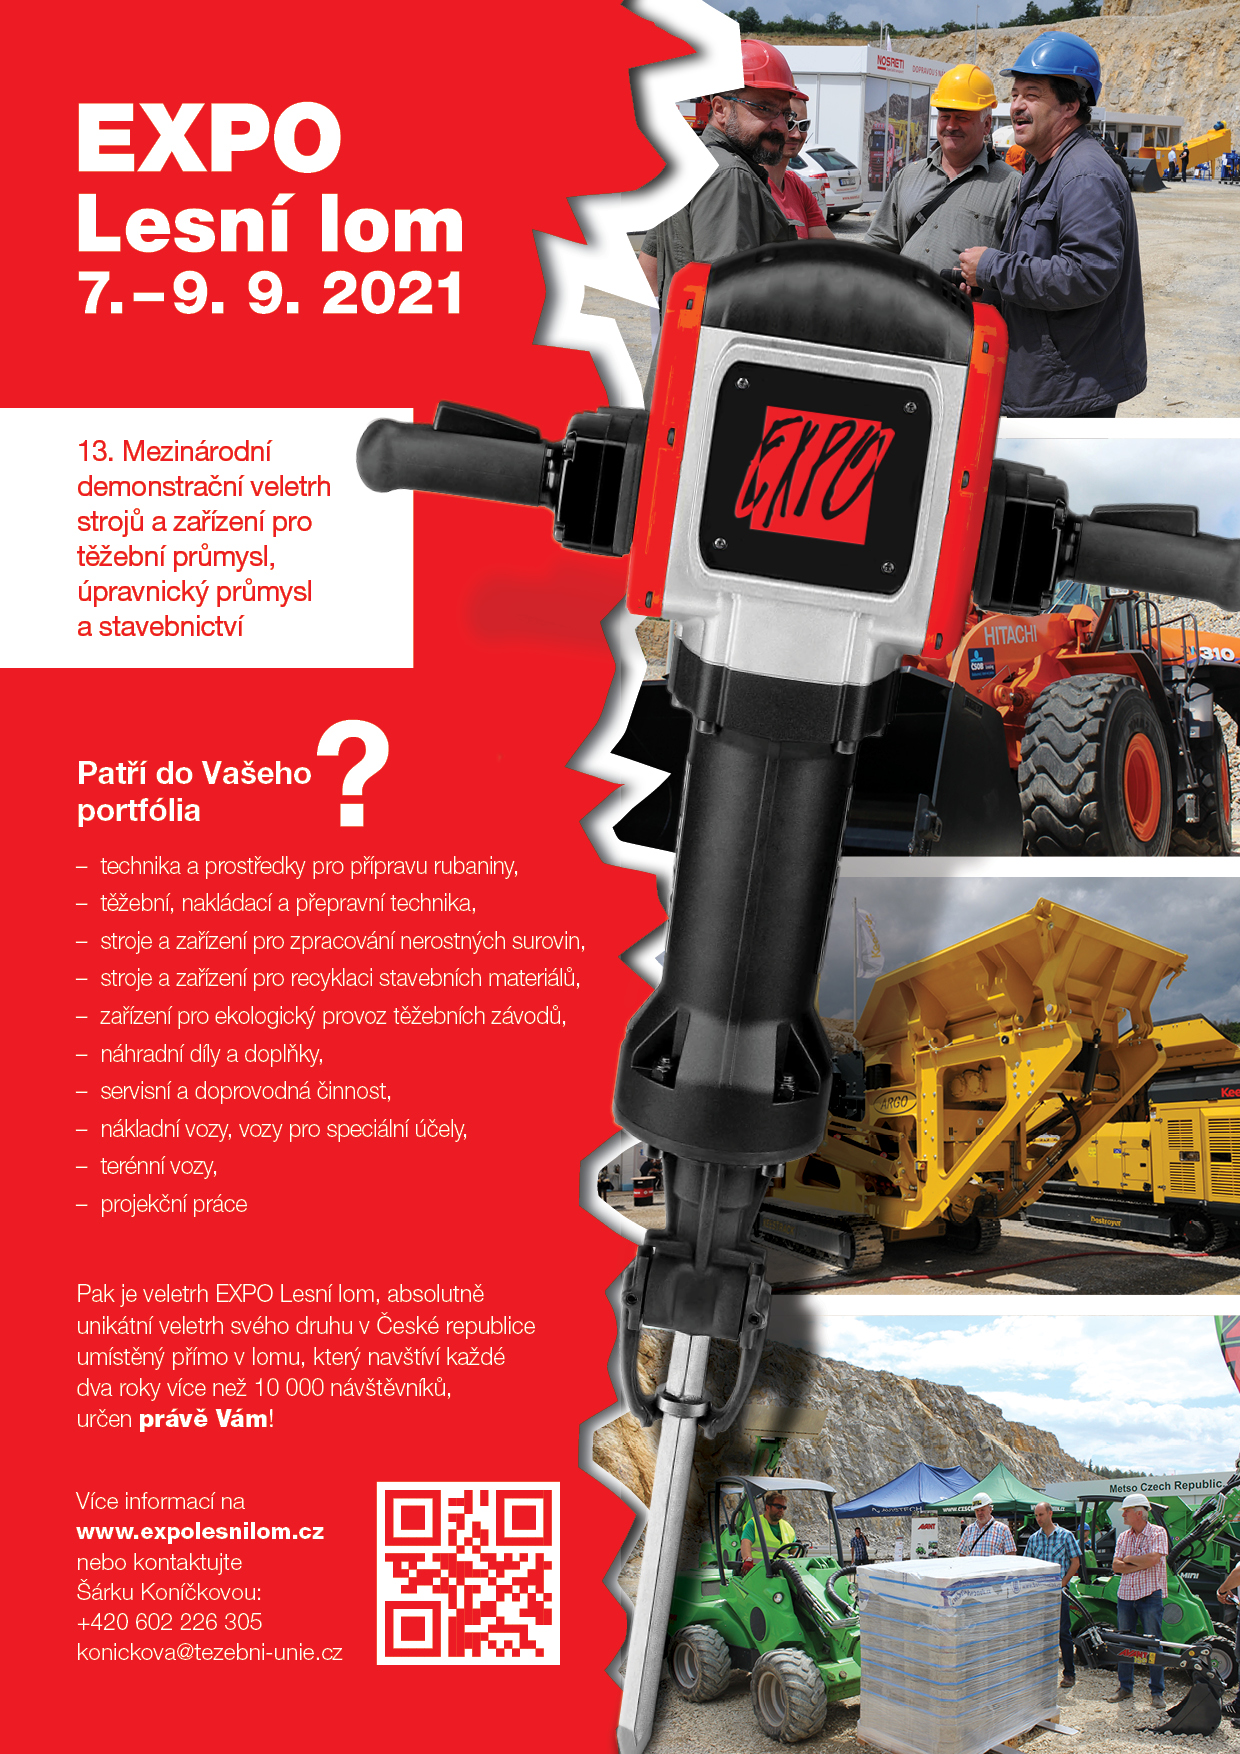 Expo21-09_inzerce_2021-02-01_210x297mm_TISK-01_CZE-C_bez-orez